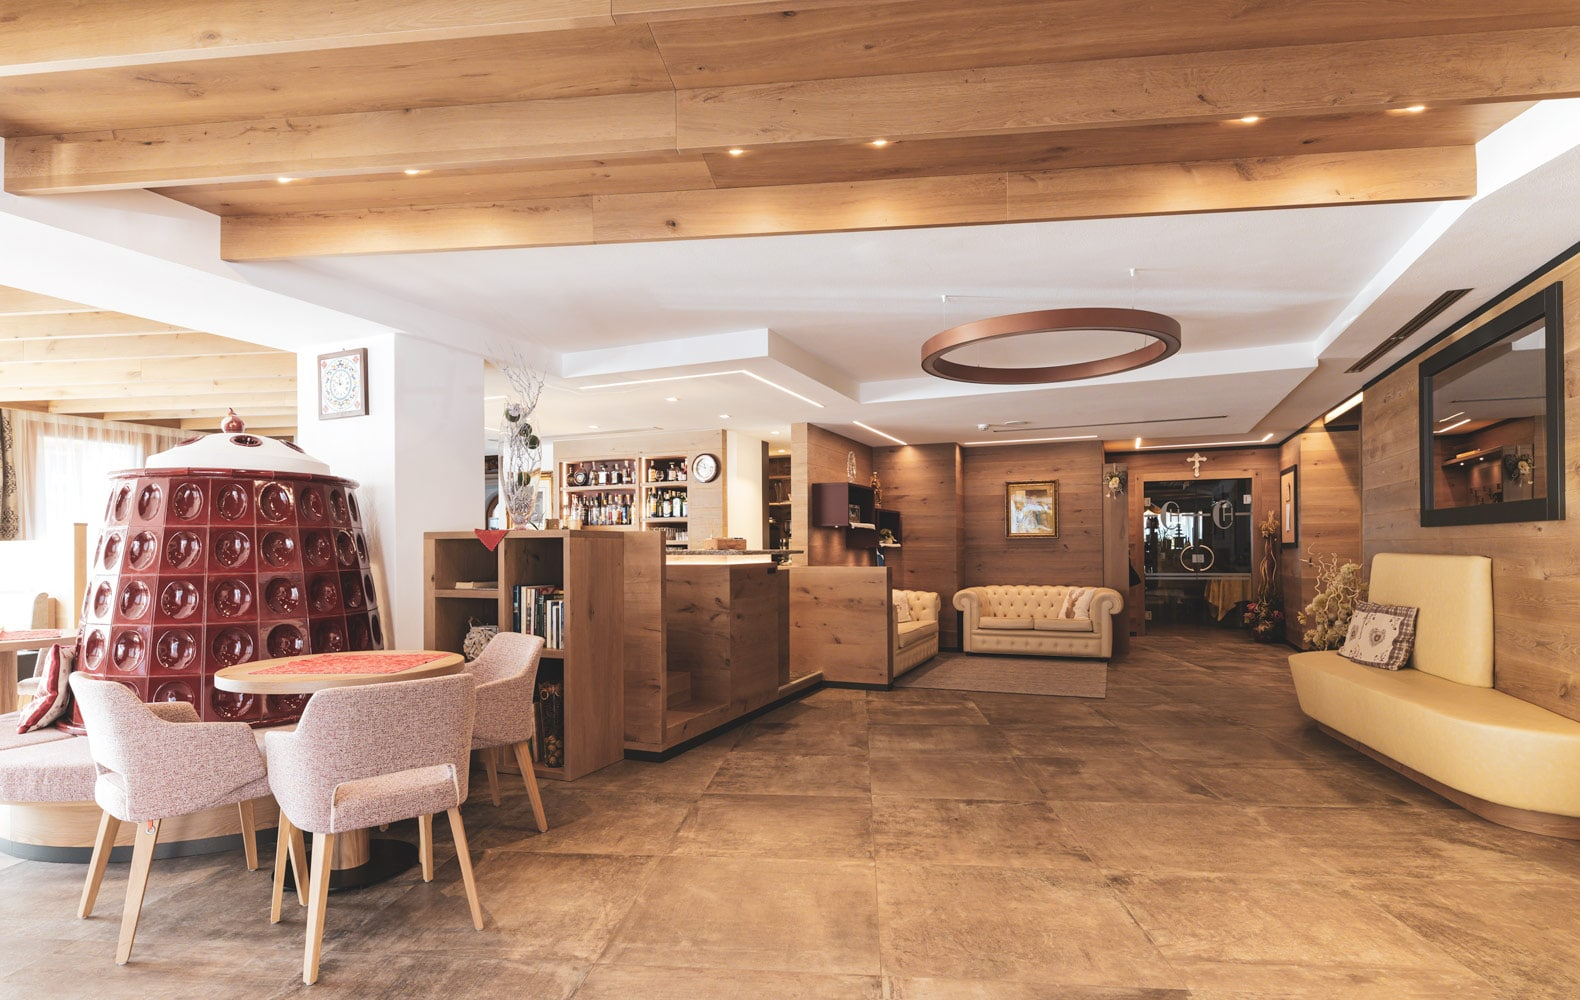 Delta Contract Galley Home